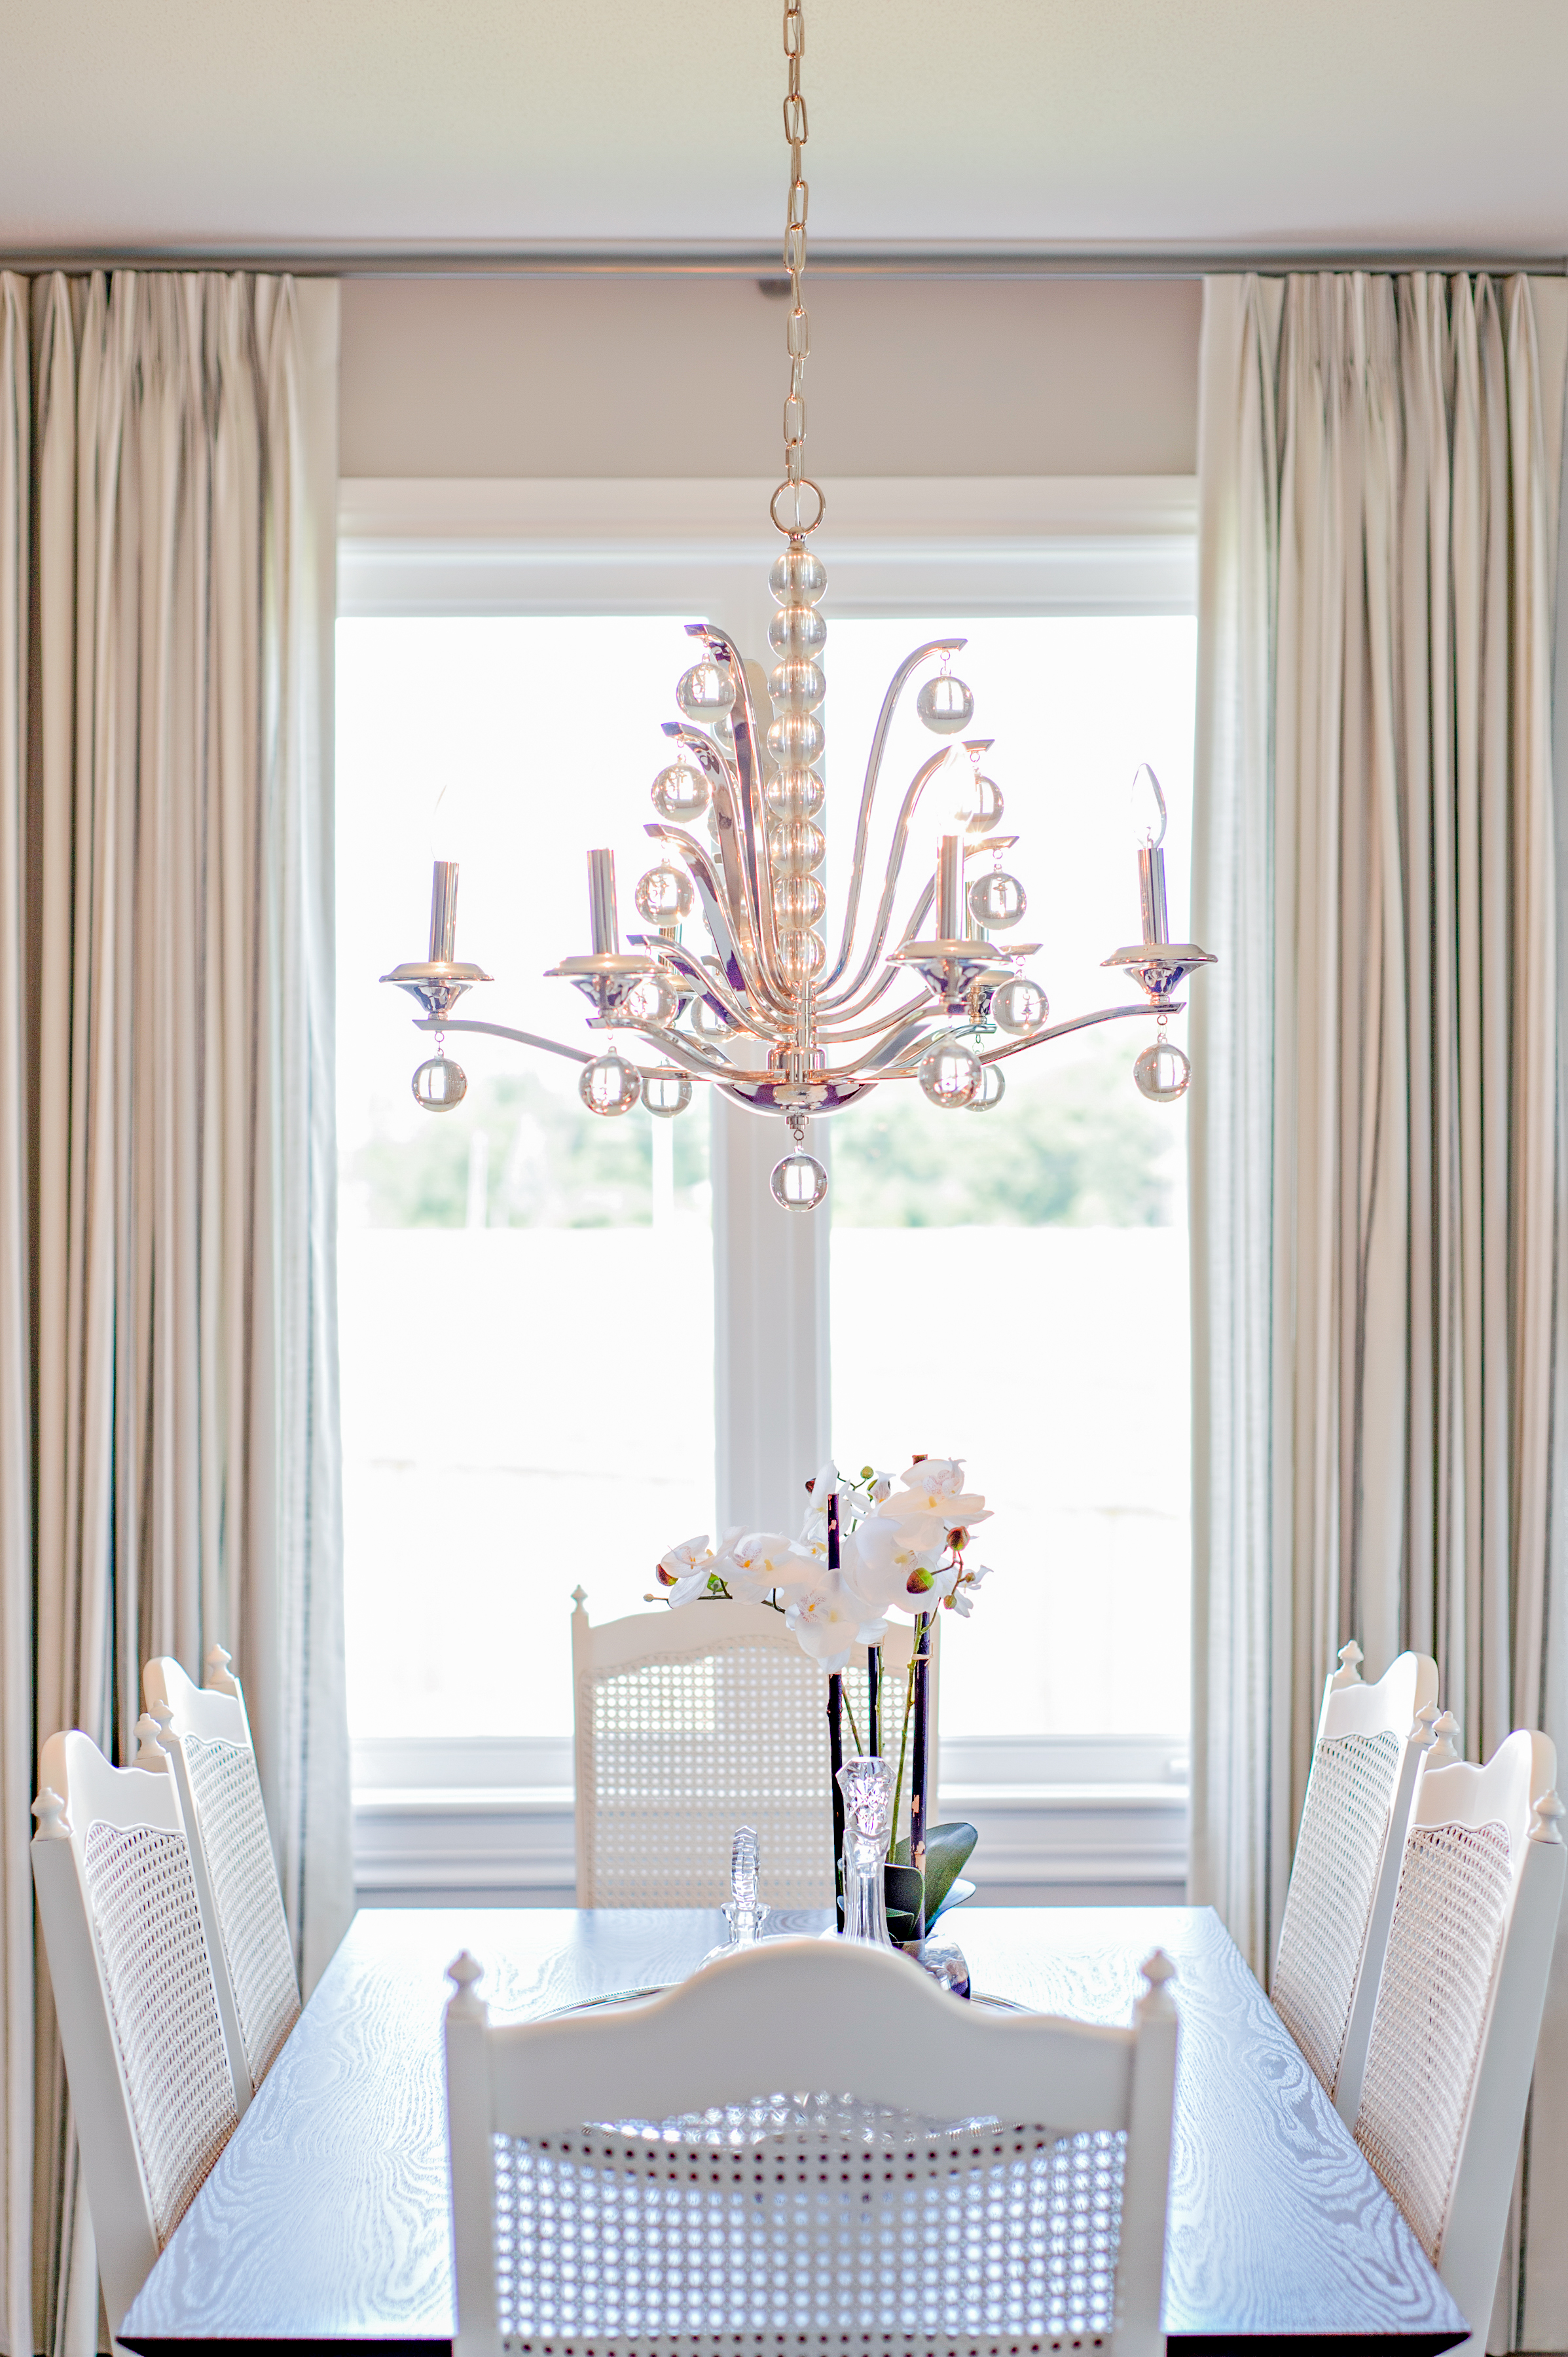 Candace-Plotz-Interior-Design-Mcgregor-Dining-Table.jpg